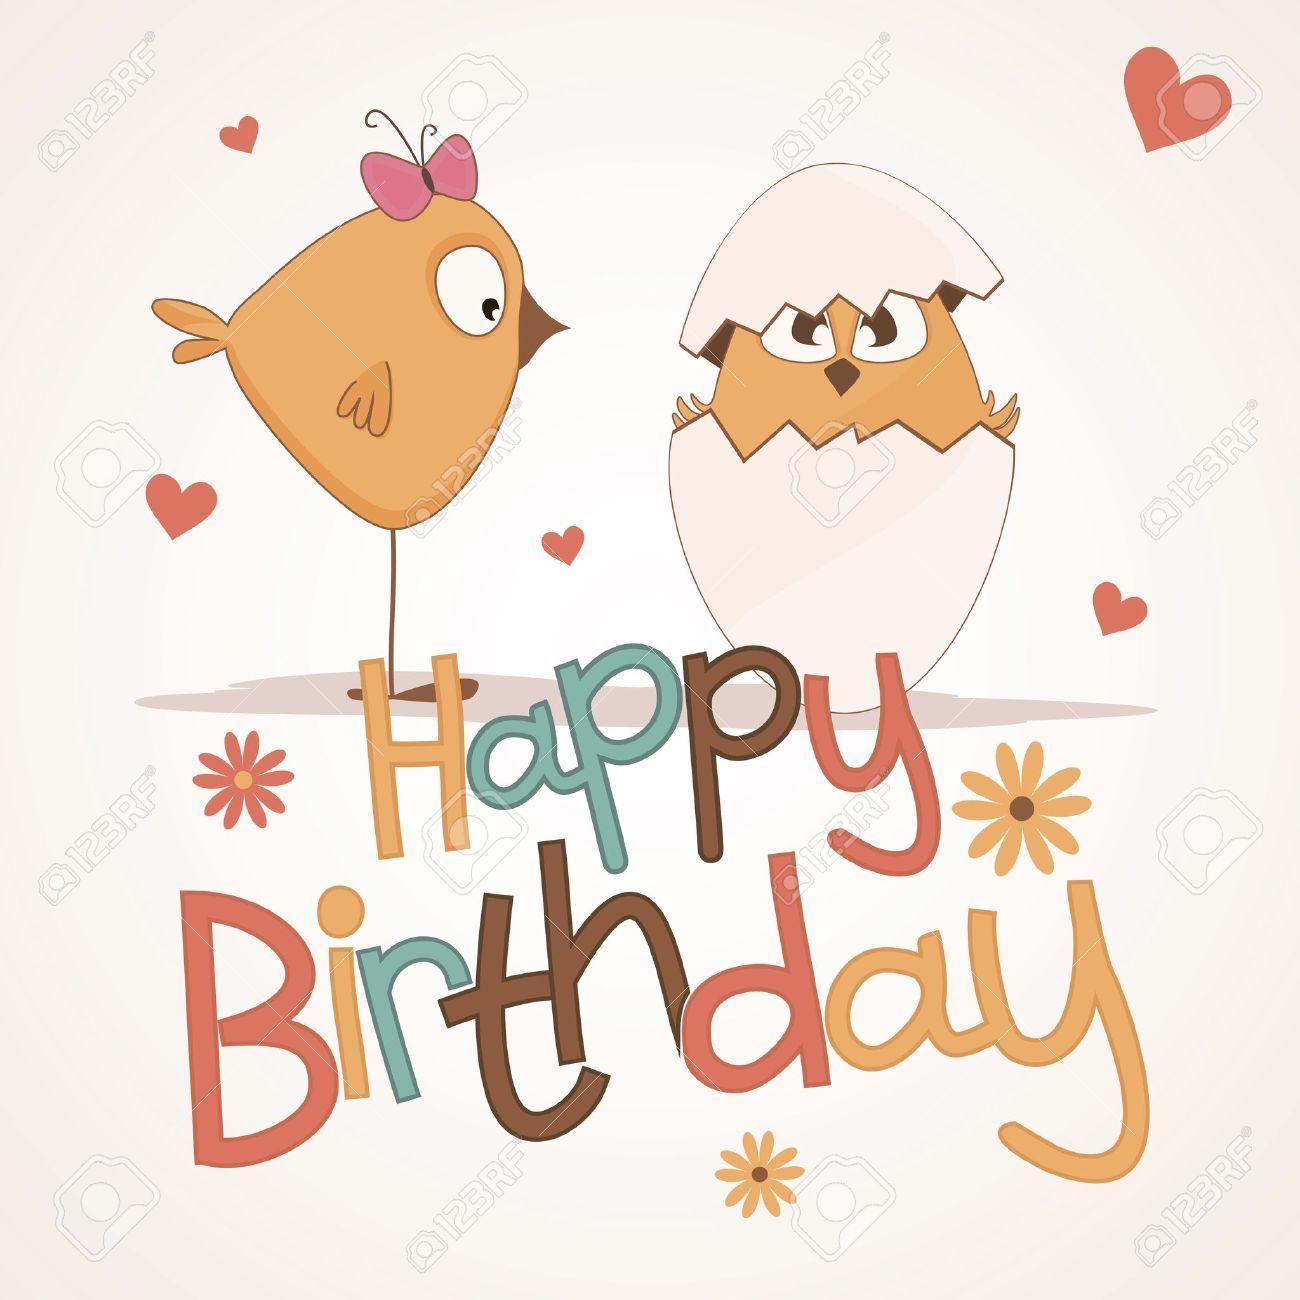 happy birthday three minute egg - Google Search